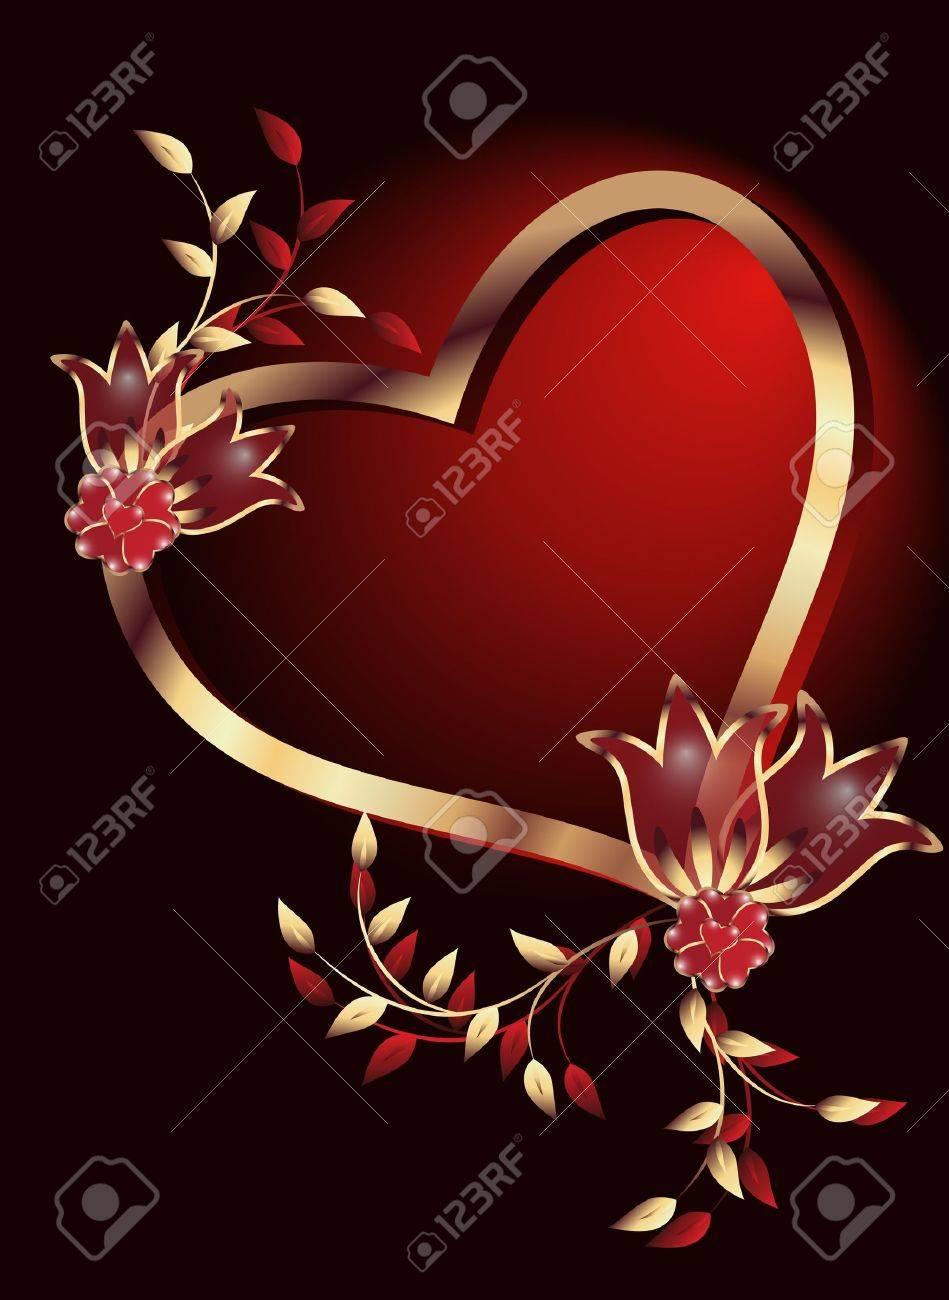 Day Valentine Stock Vector - 11204810